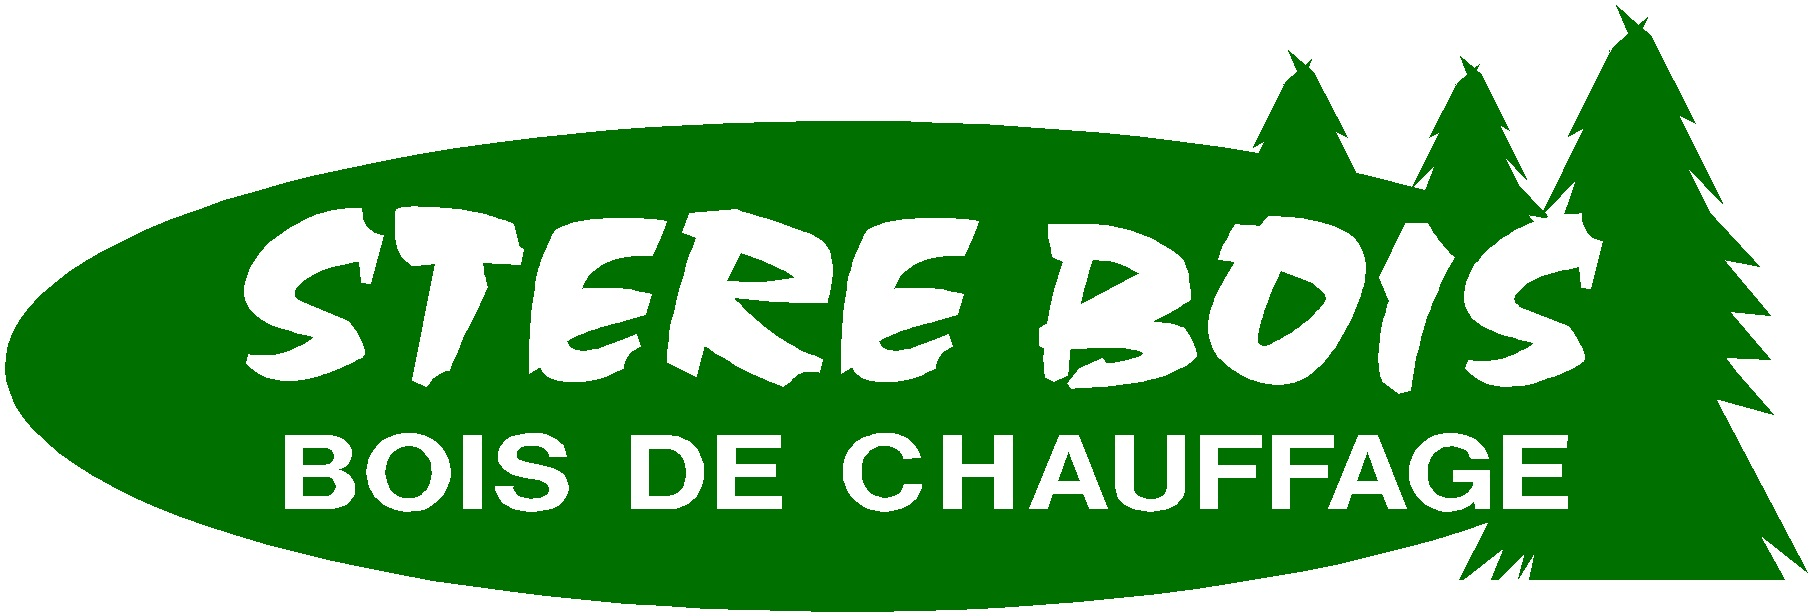 St u00e8re Bois Granules,Bois de chauffage , Roche la Moli u00e8re, Loire , St Etienne # Temps De Sechage Bois De Chauffage Chene